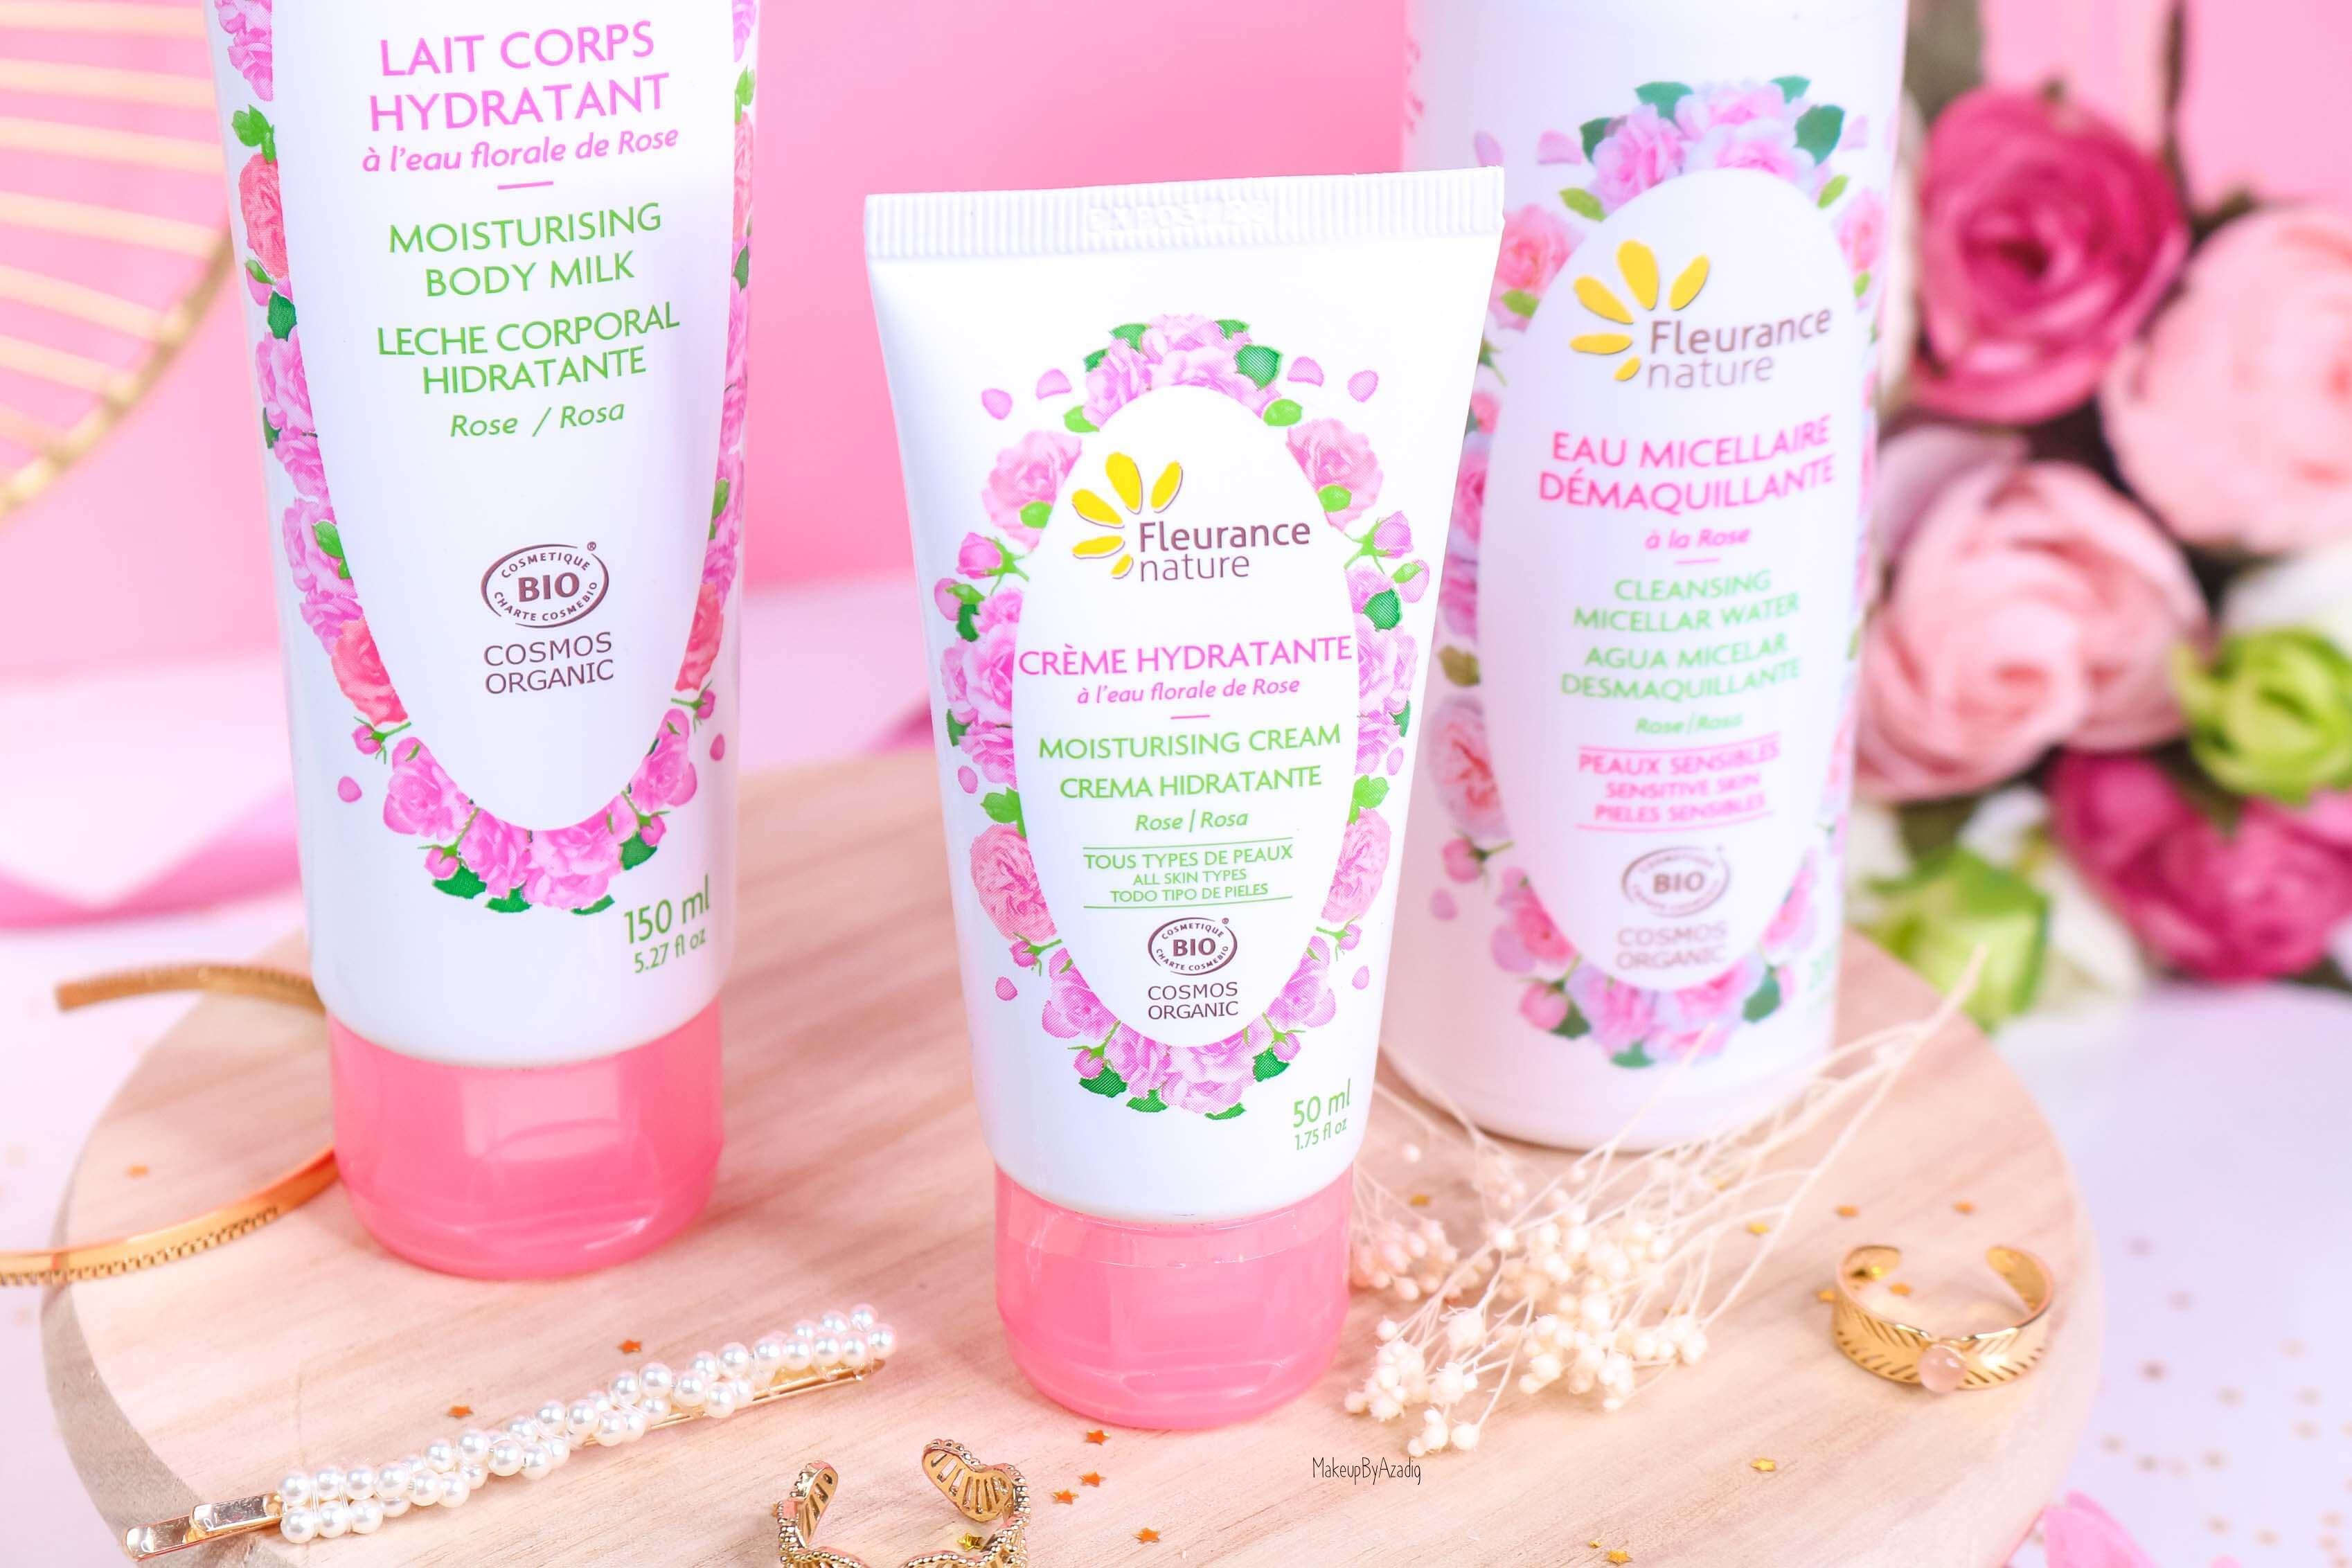 revue-produit-corps-visage-rose-fleurance-nature-hydratant-bio-cosmos-organic-avis-prix-makeupbyazadig-eau-micellaire-flower